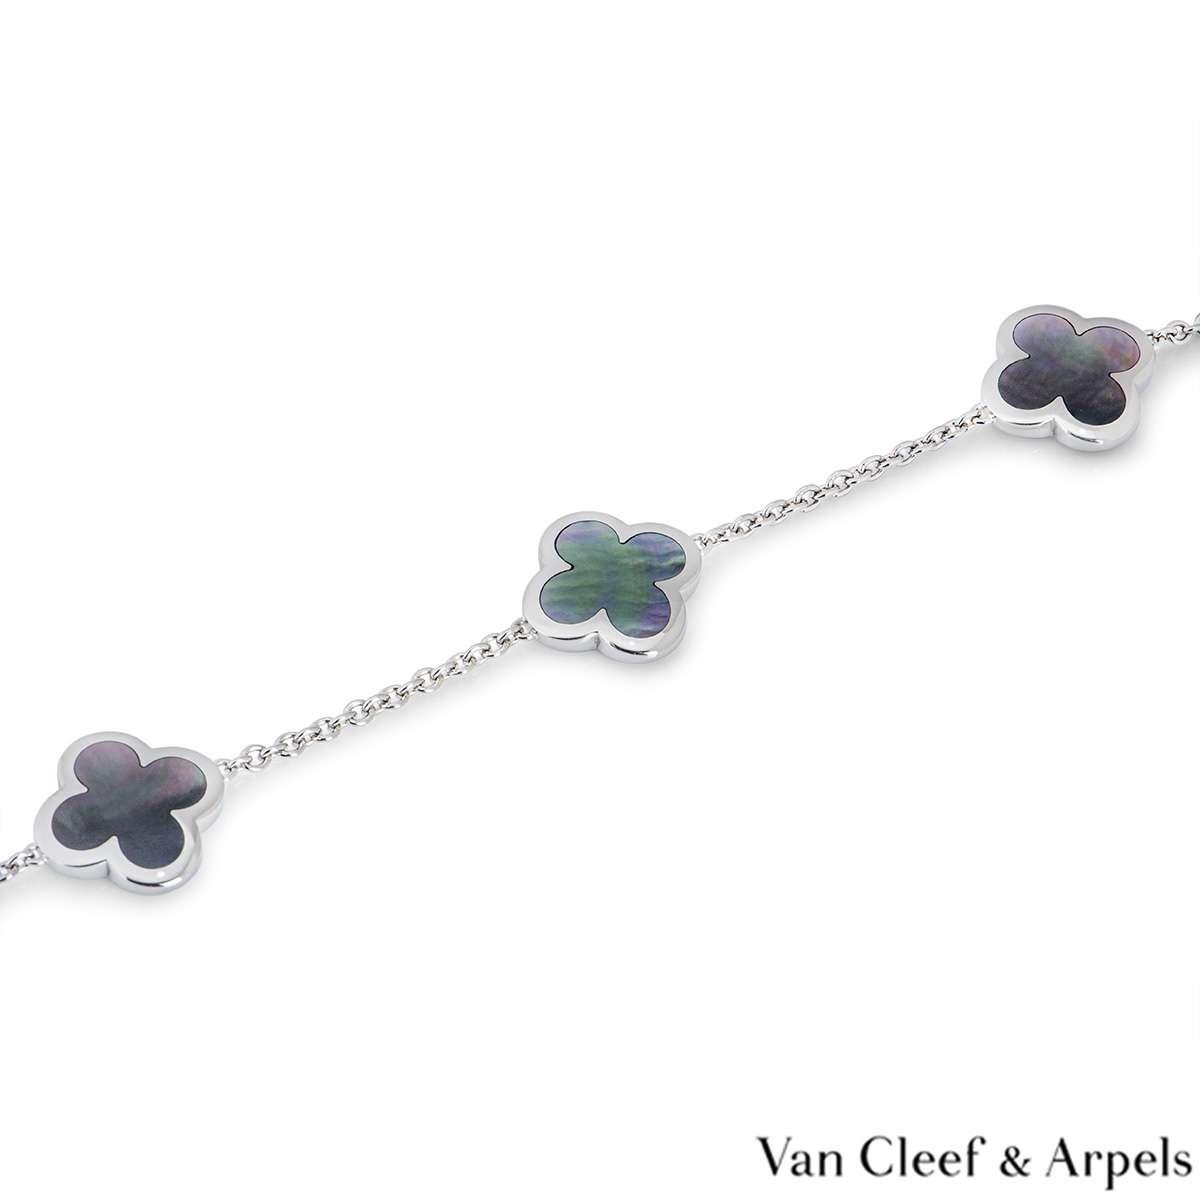 Van Cleef & Arpels White Gold Pure Alhambra Bracelet